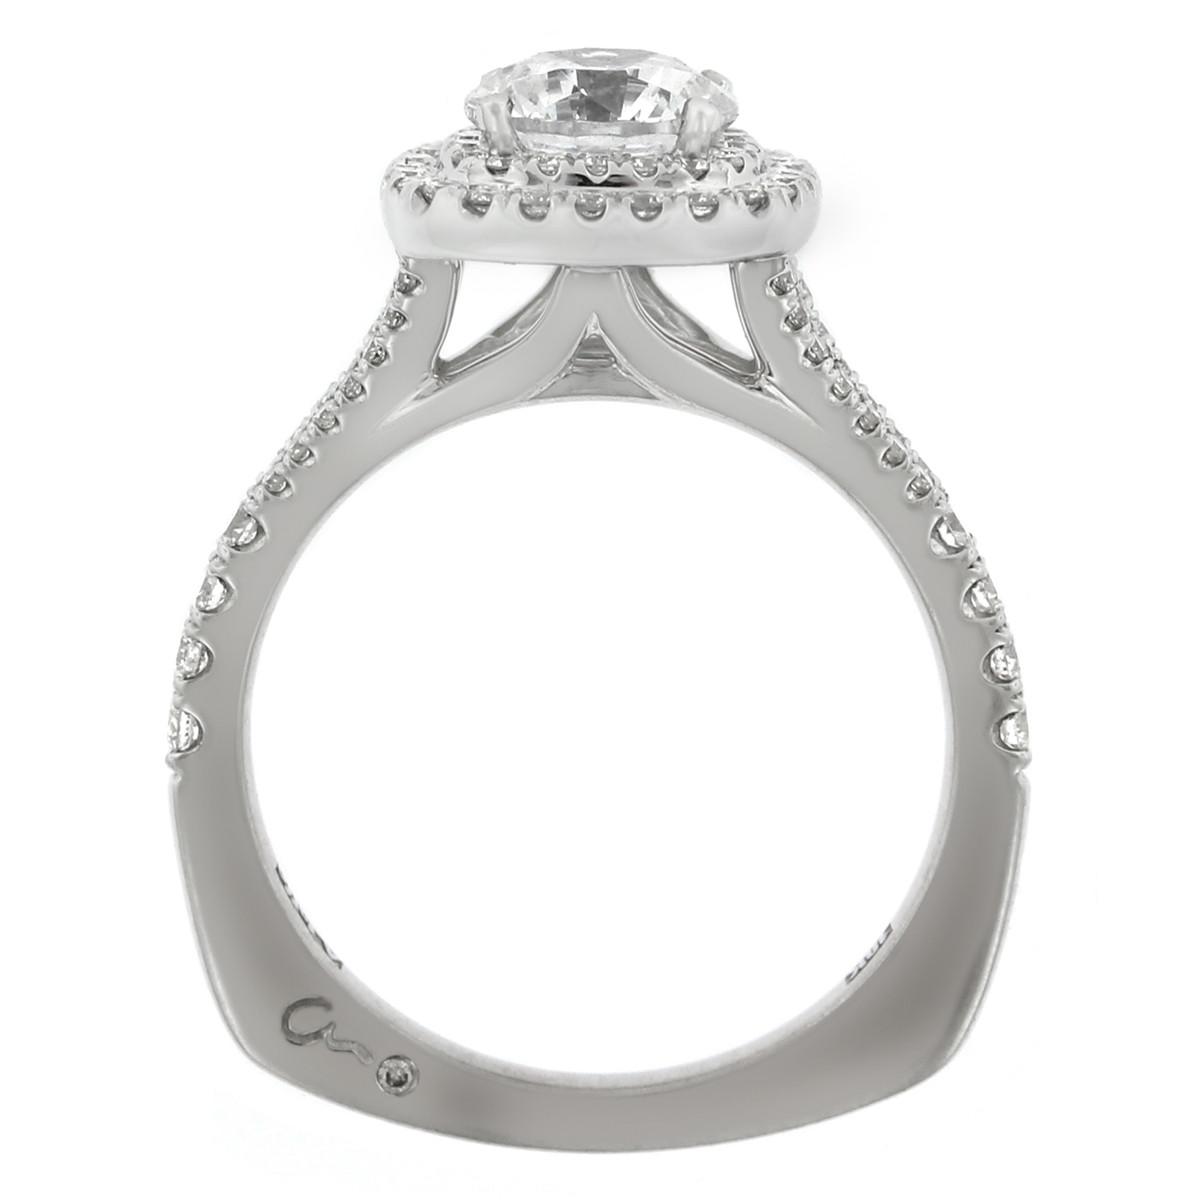 18K White Gold Split Shank Double Diamond Halo Engagement Ring